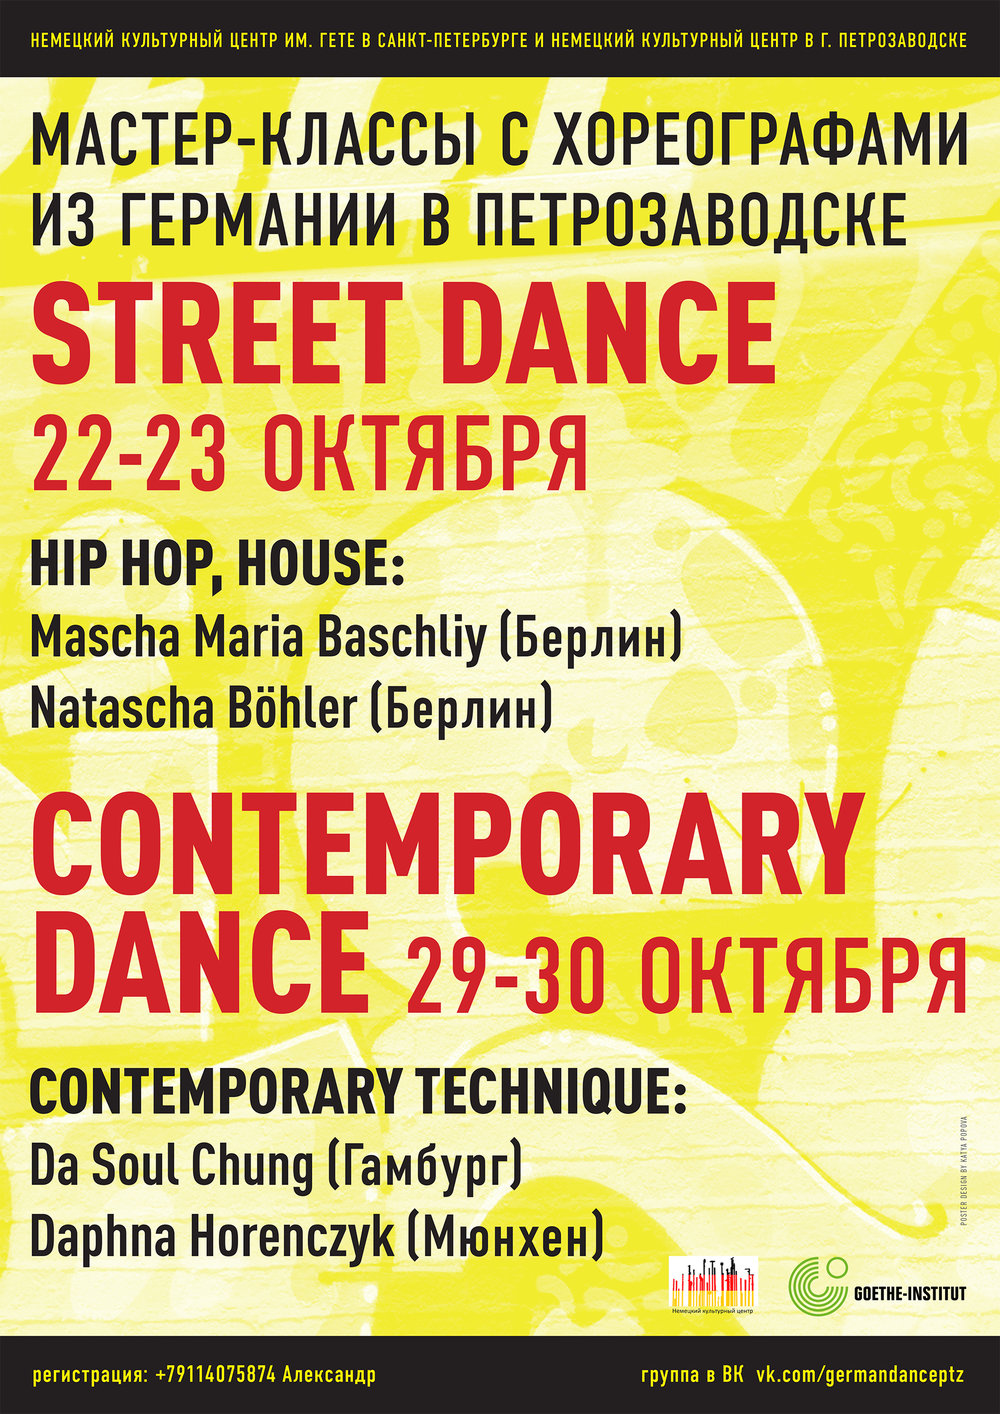 poster_hiphop_house.jpg